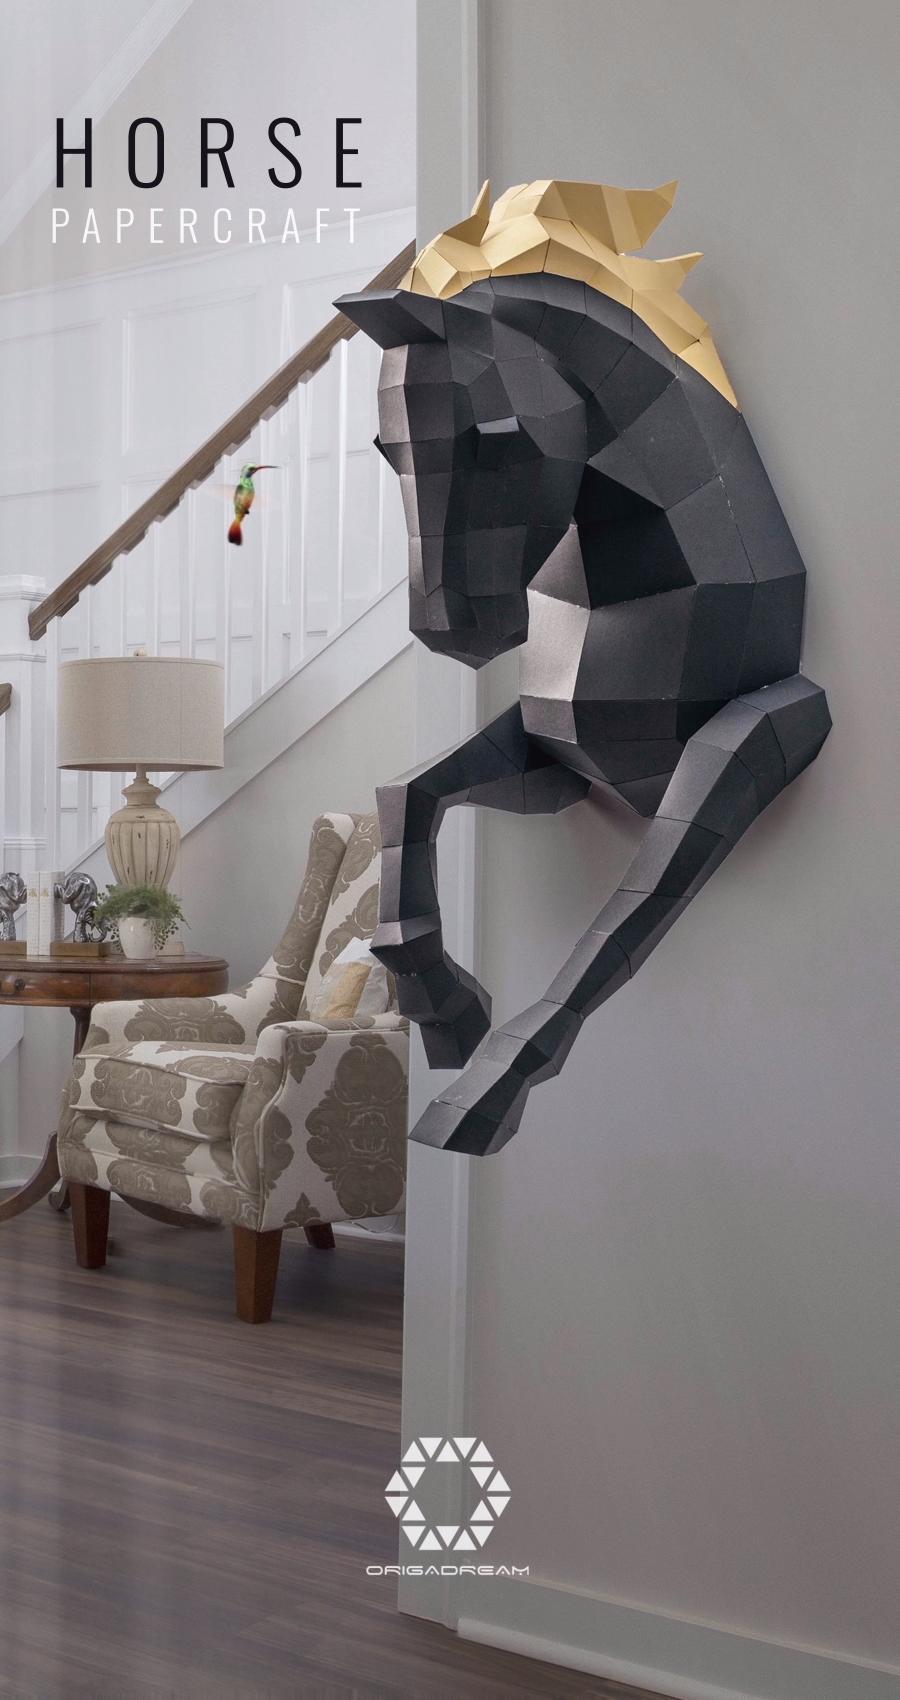 Amazing papercraft Horse trophy. Designer Bruno Sinnah